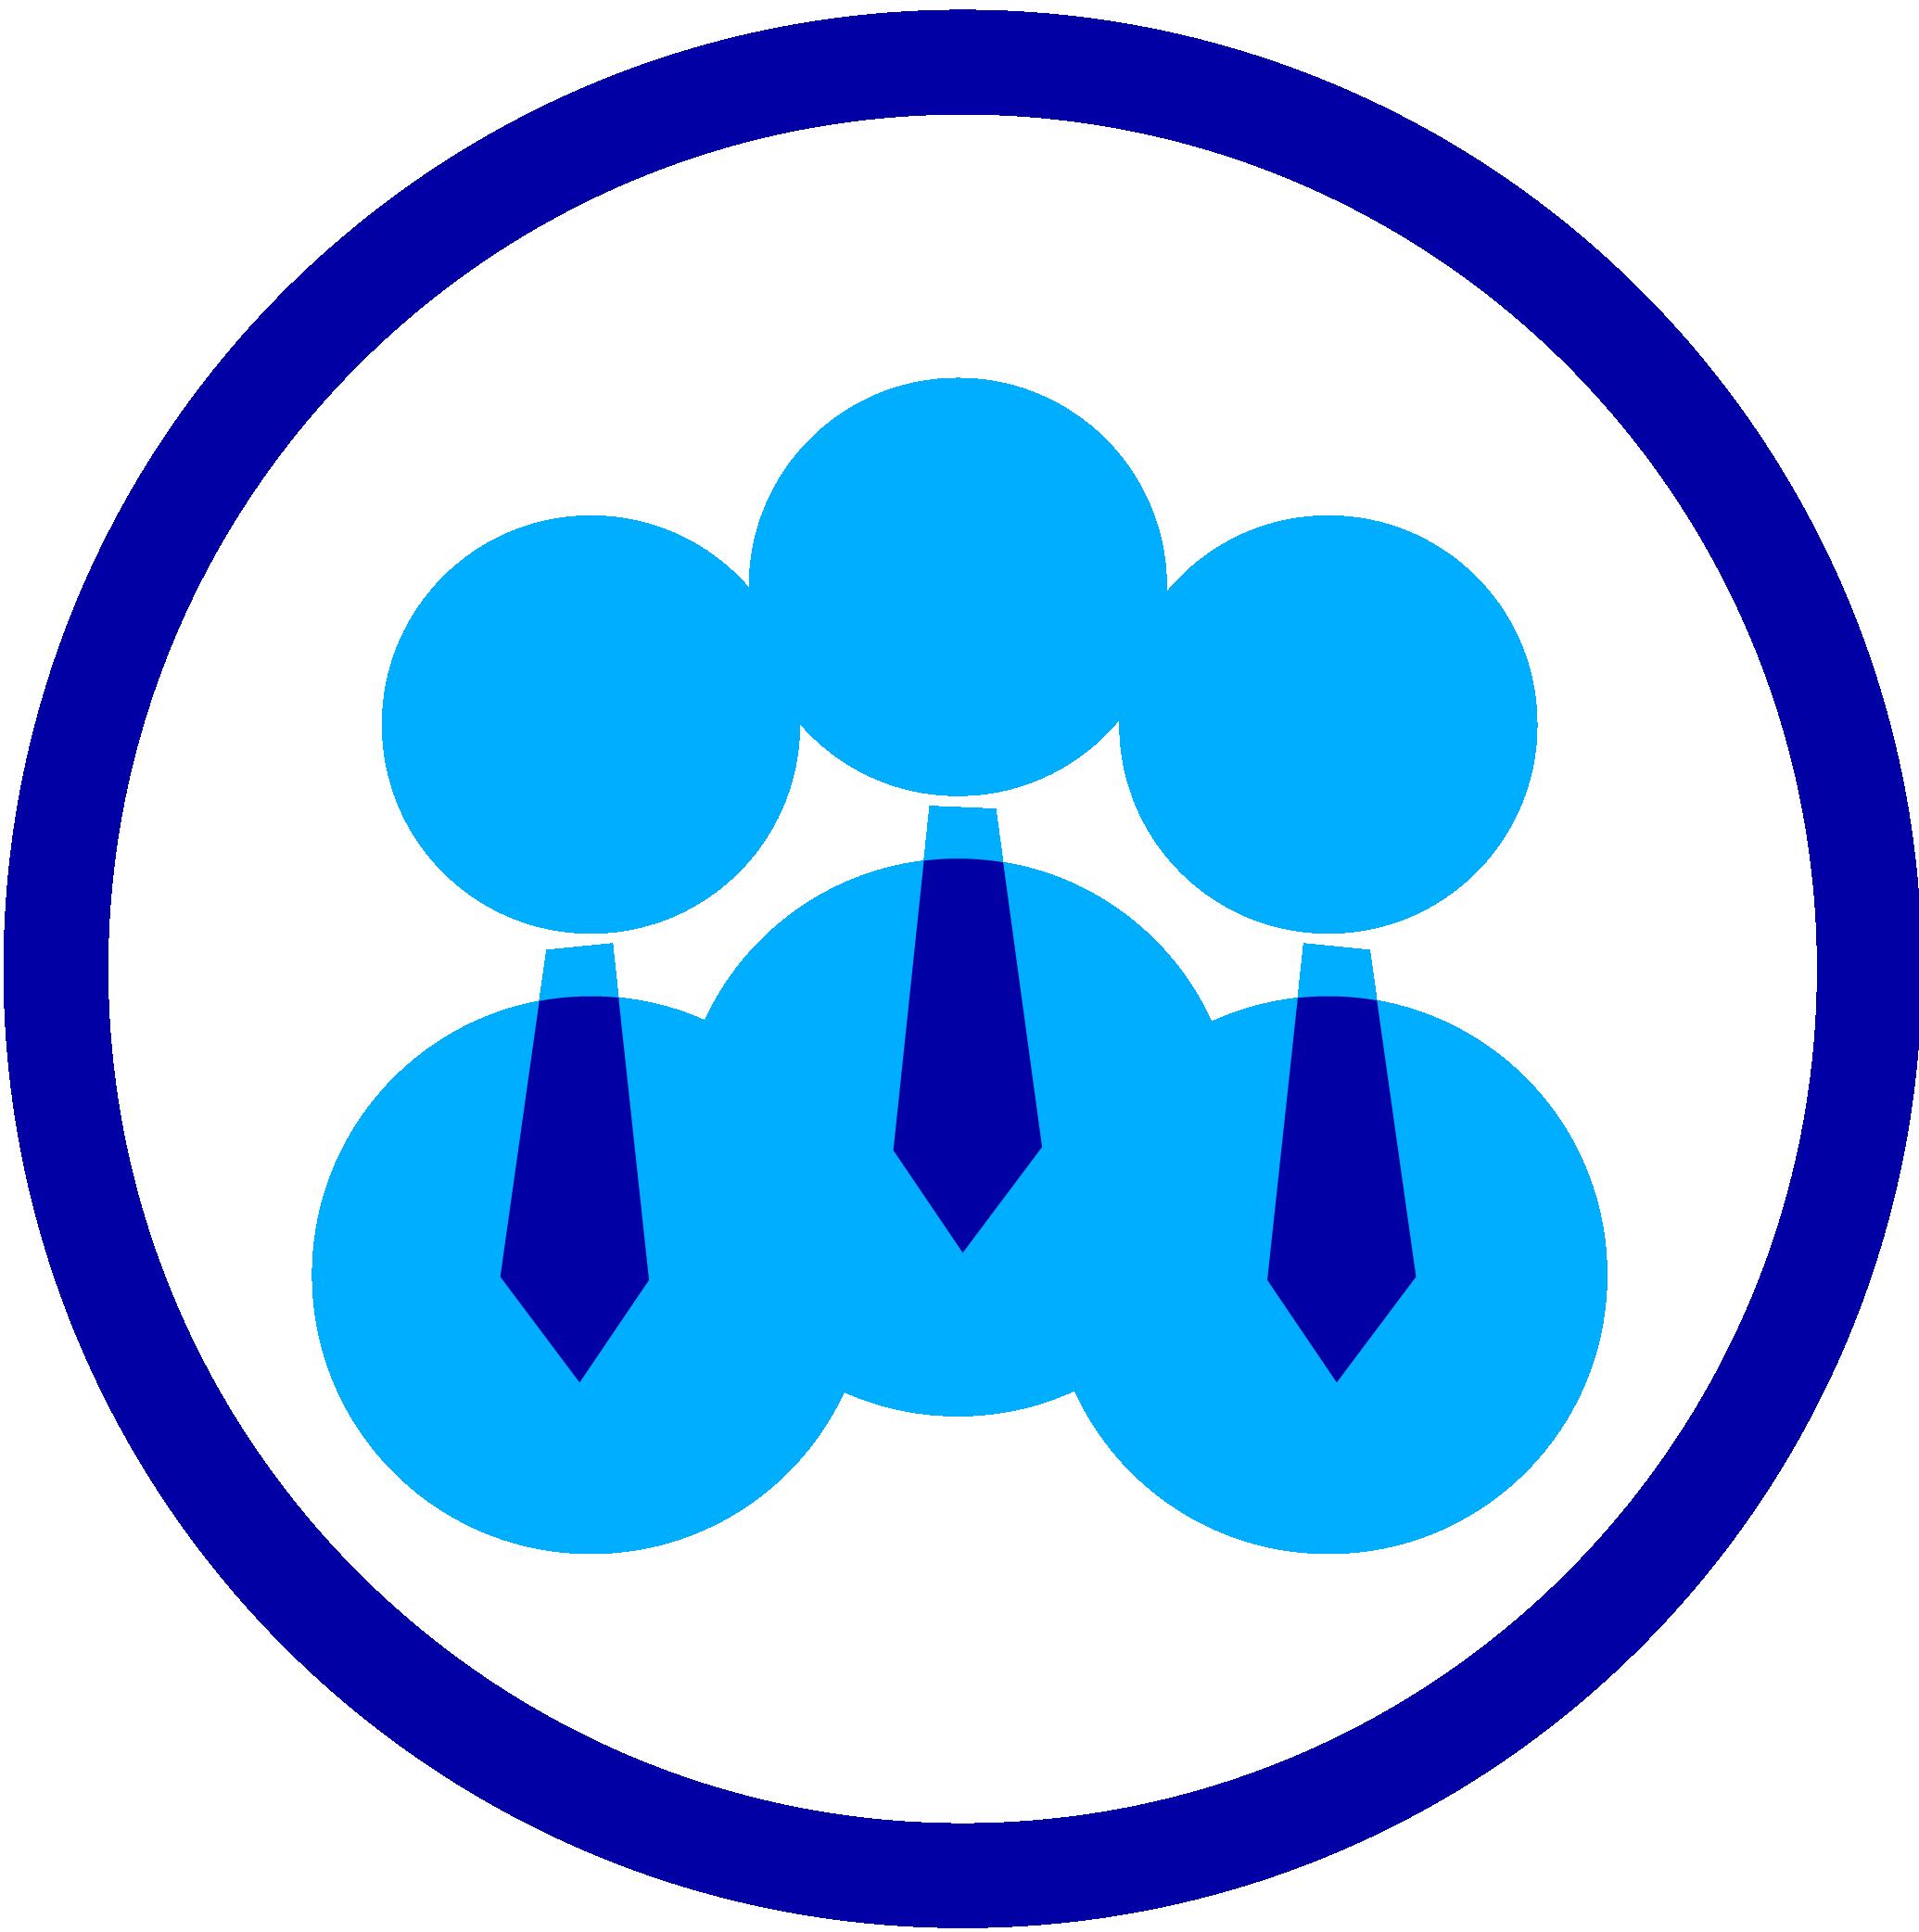 https://br.fi-group.com/wp-content/uploads/sites/9/2021/02/blue-icons-set_1-59.png